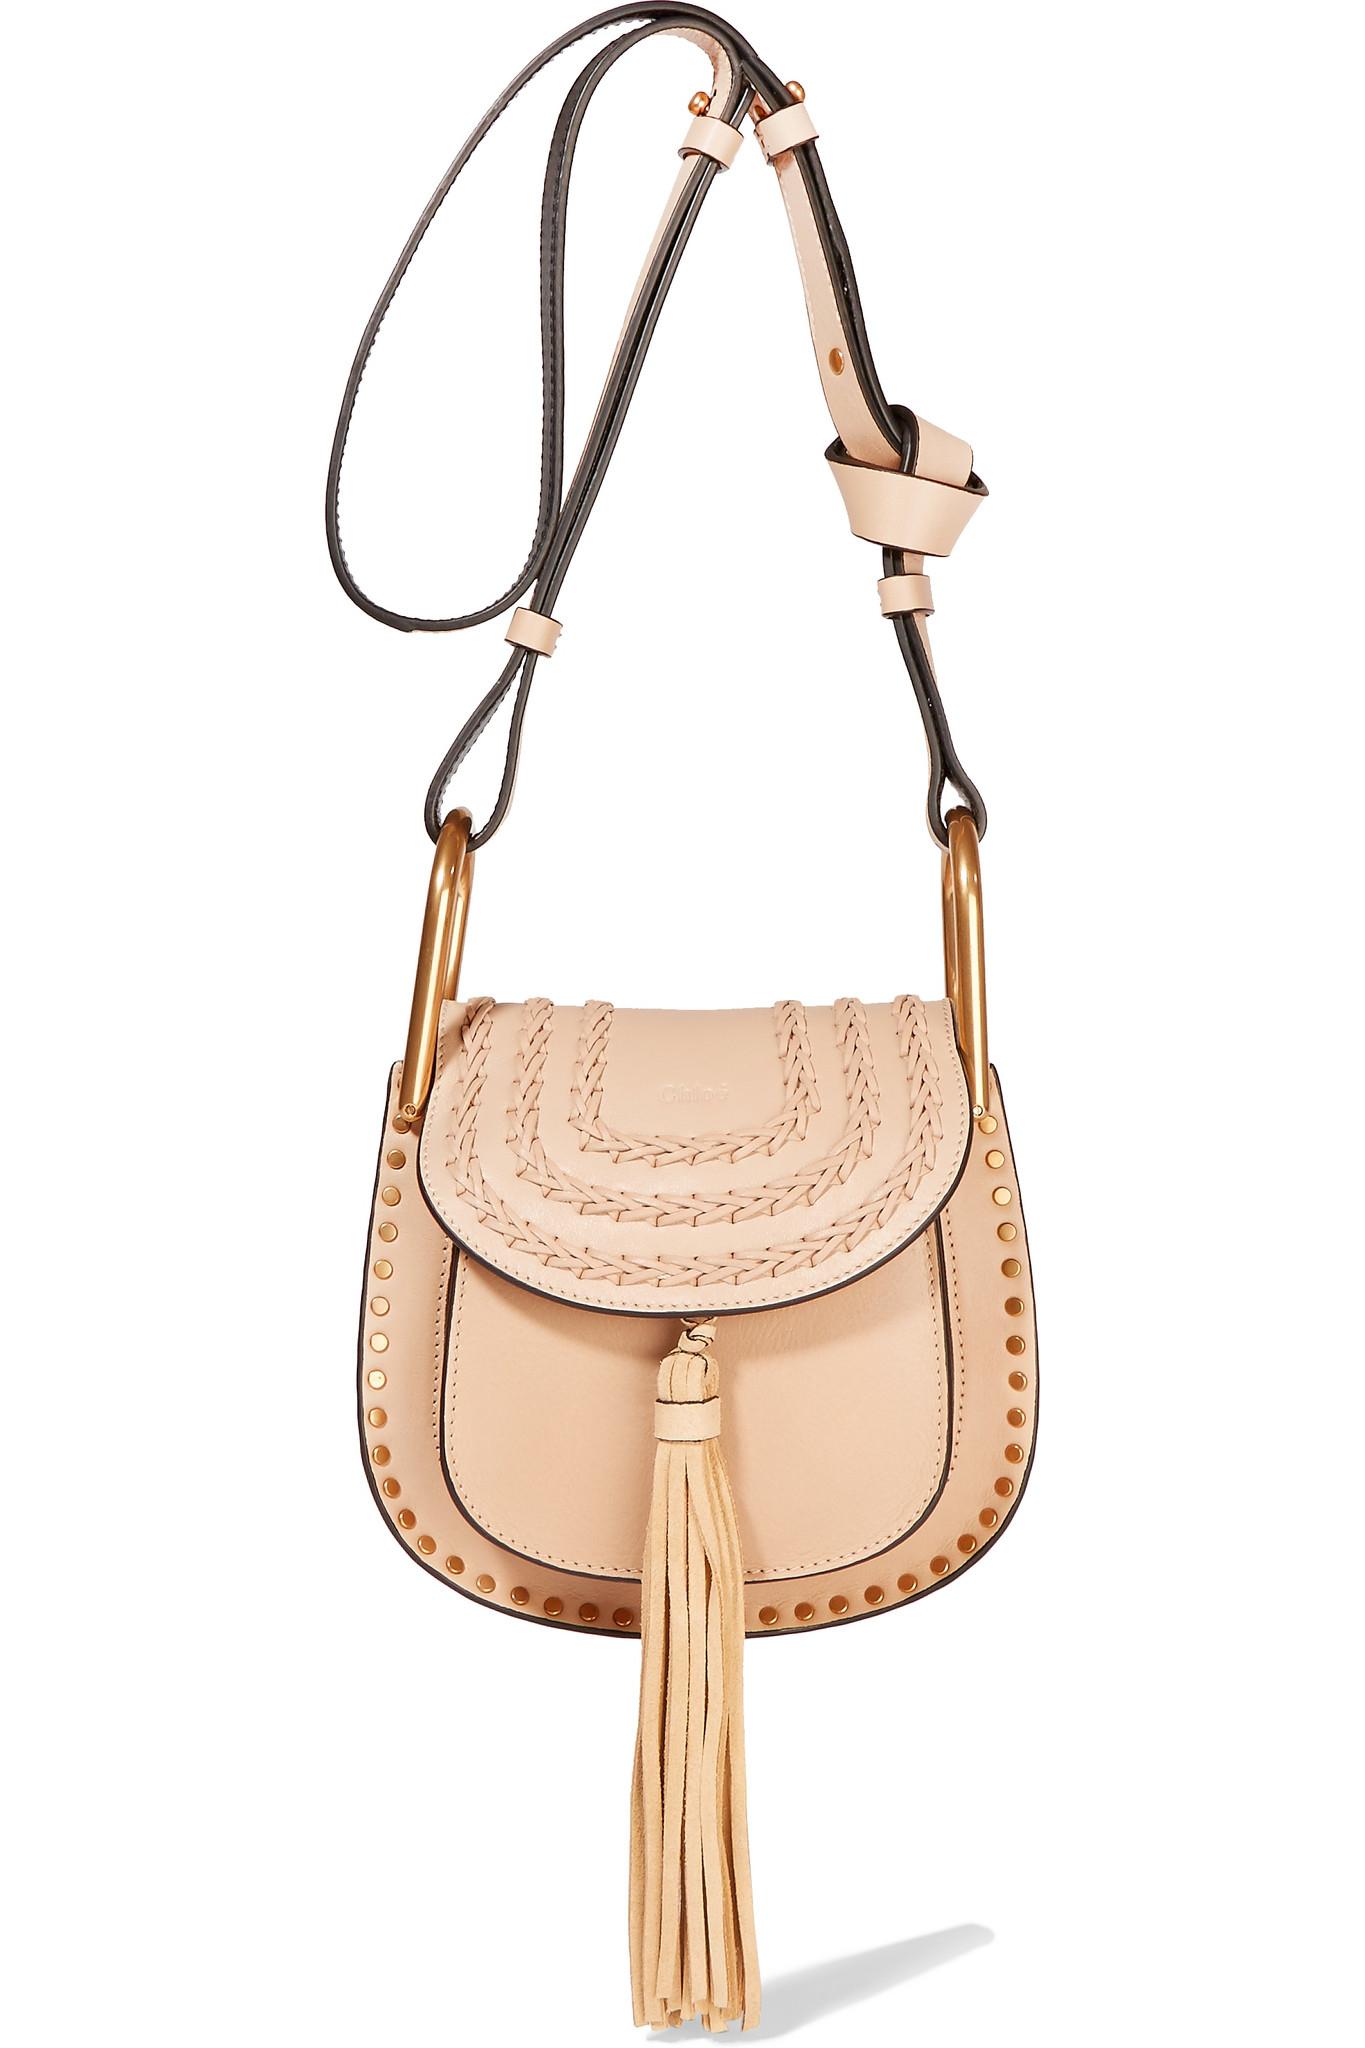 44f2394aff Chloé Hudson Mini Whipstitched Leather Shoulder Bag in Natural - Lyst